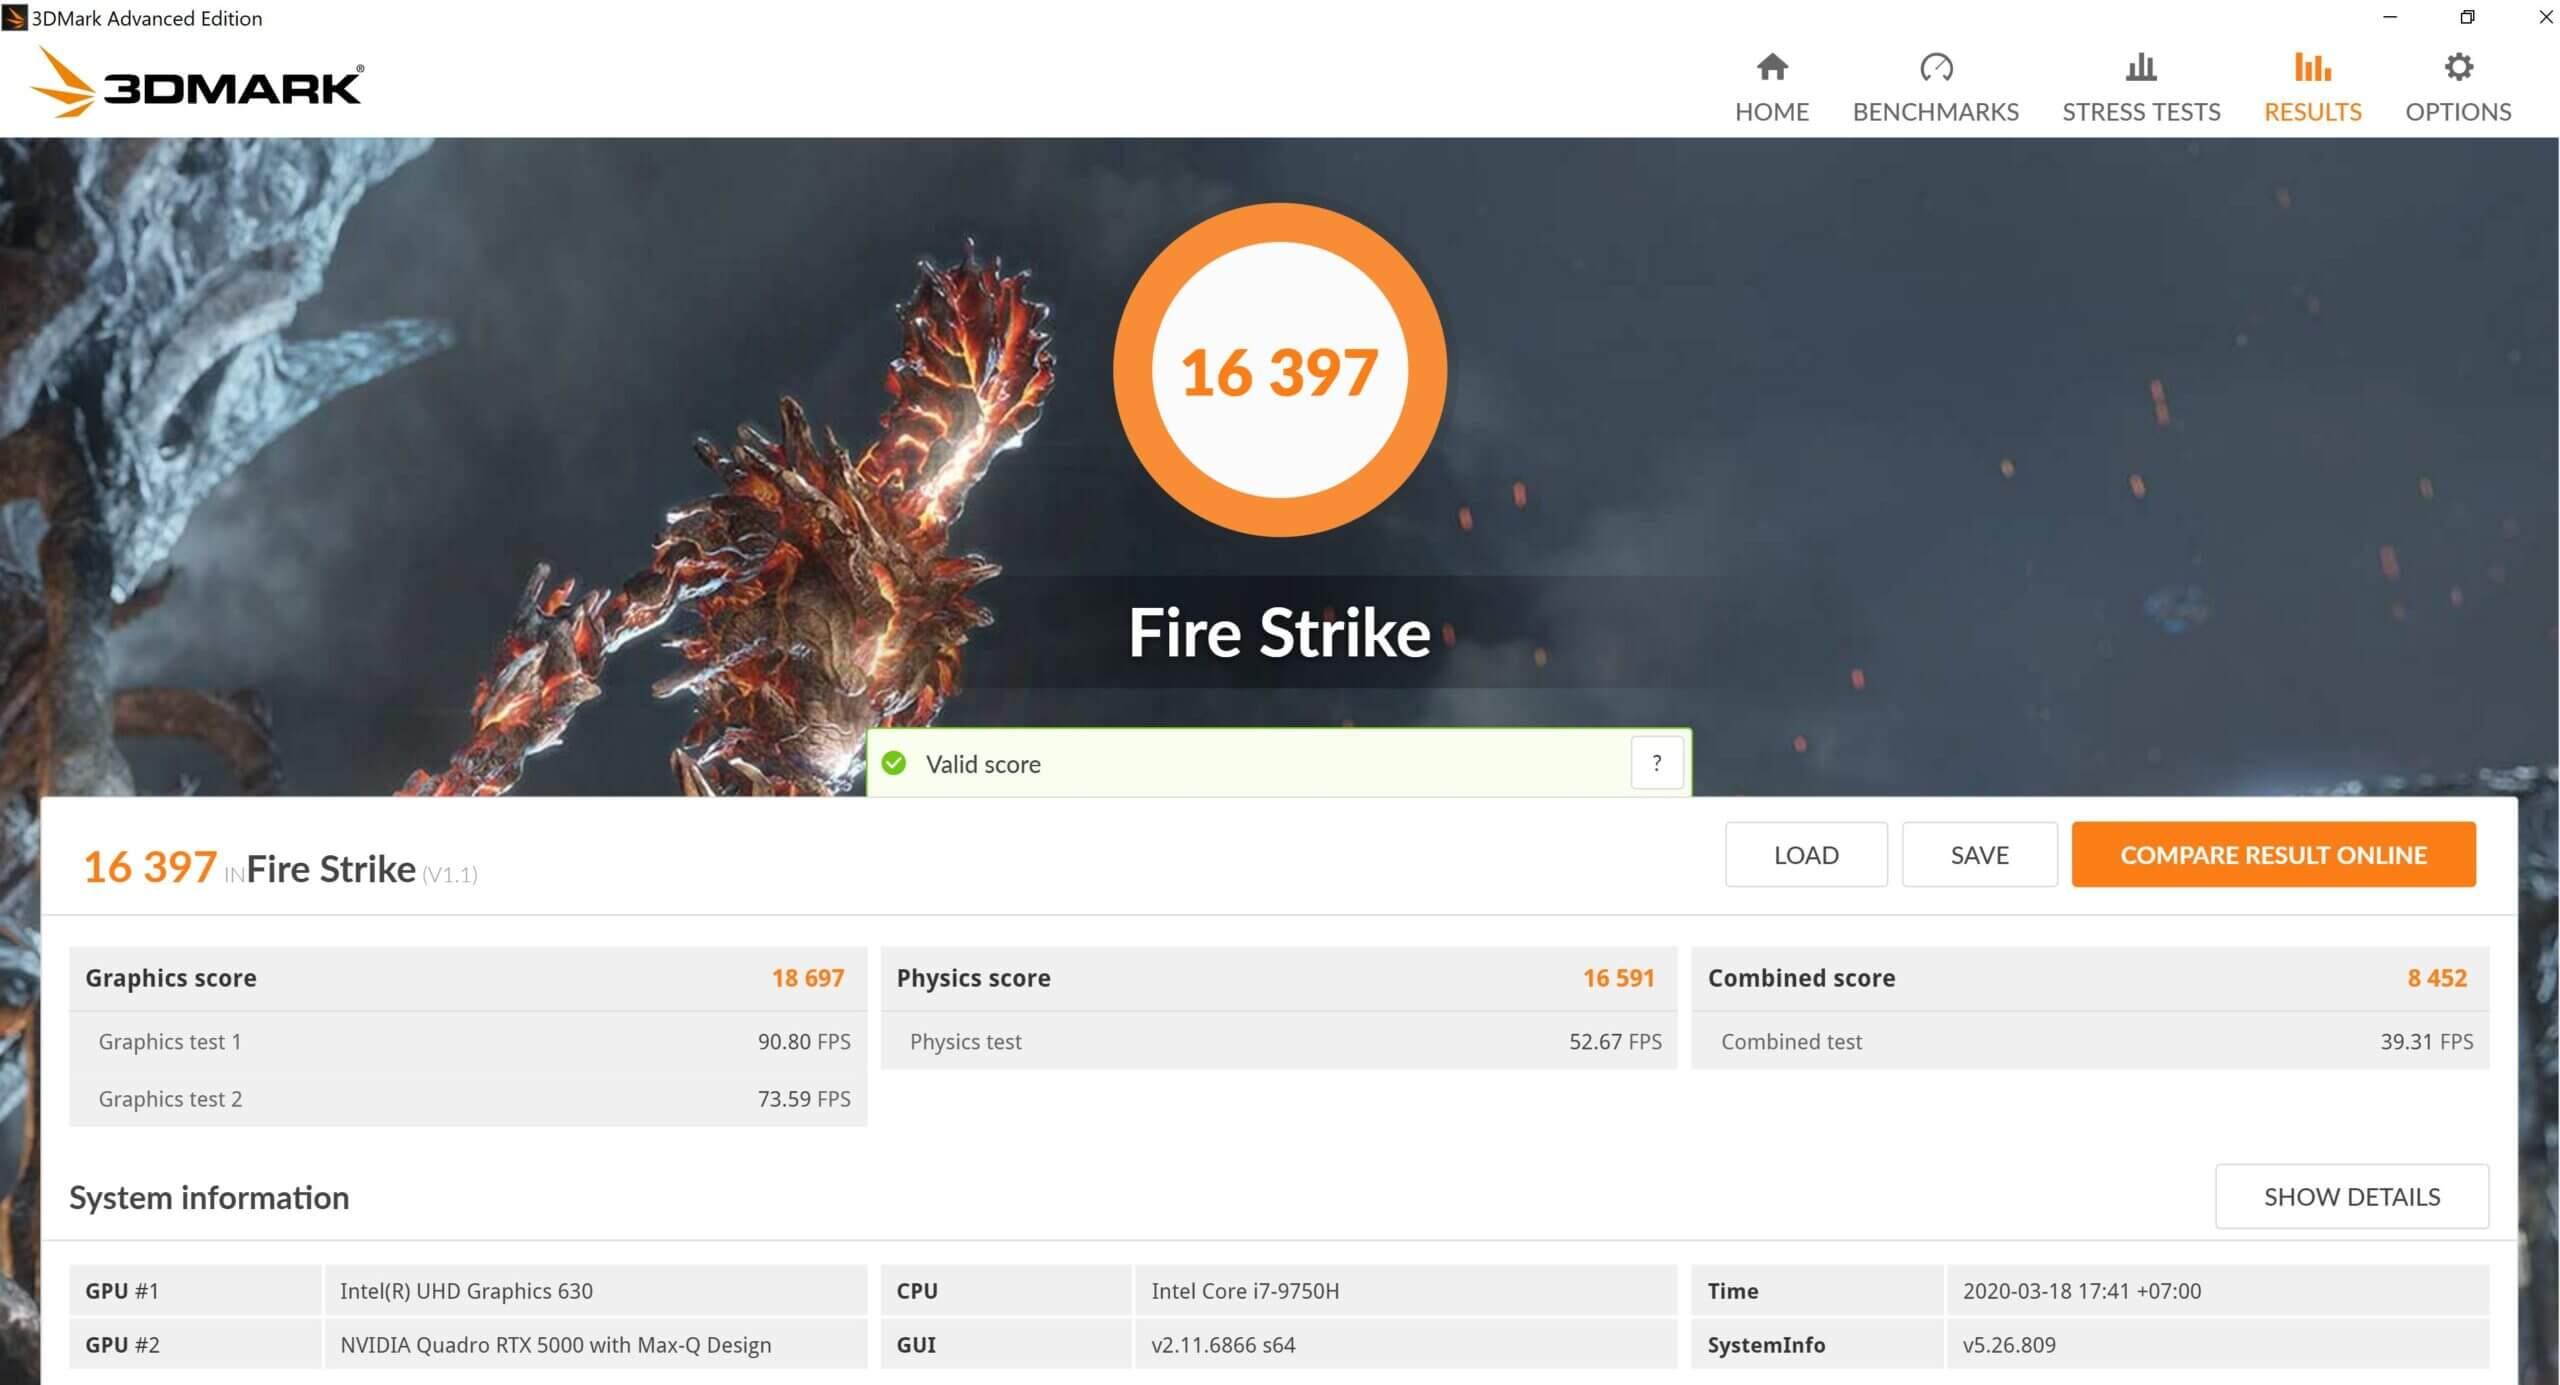 Fire Strike scaled